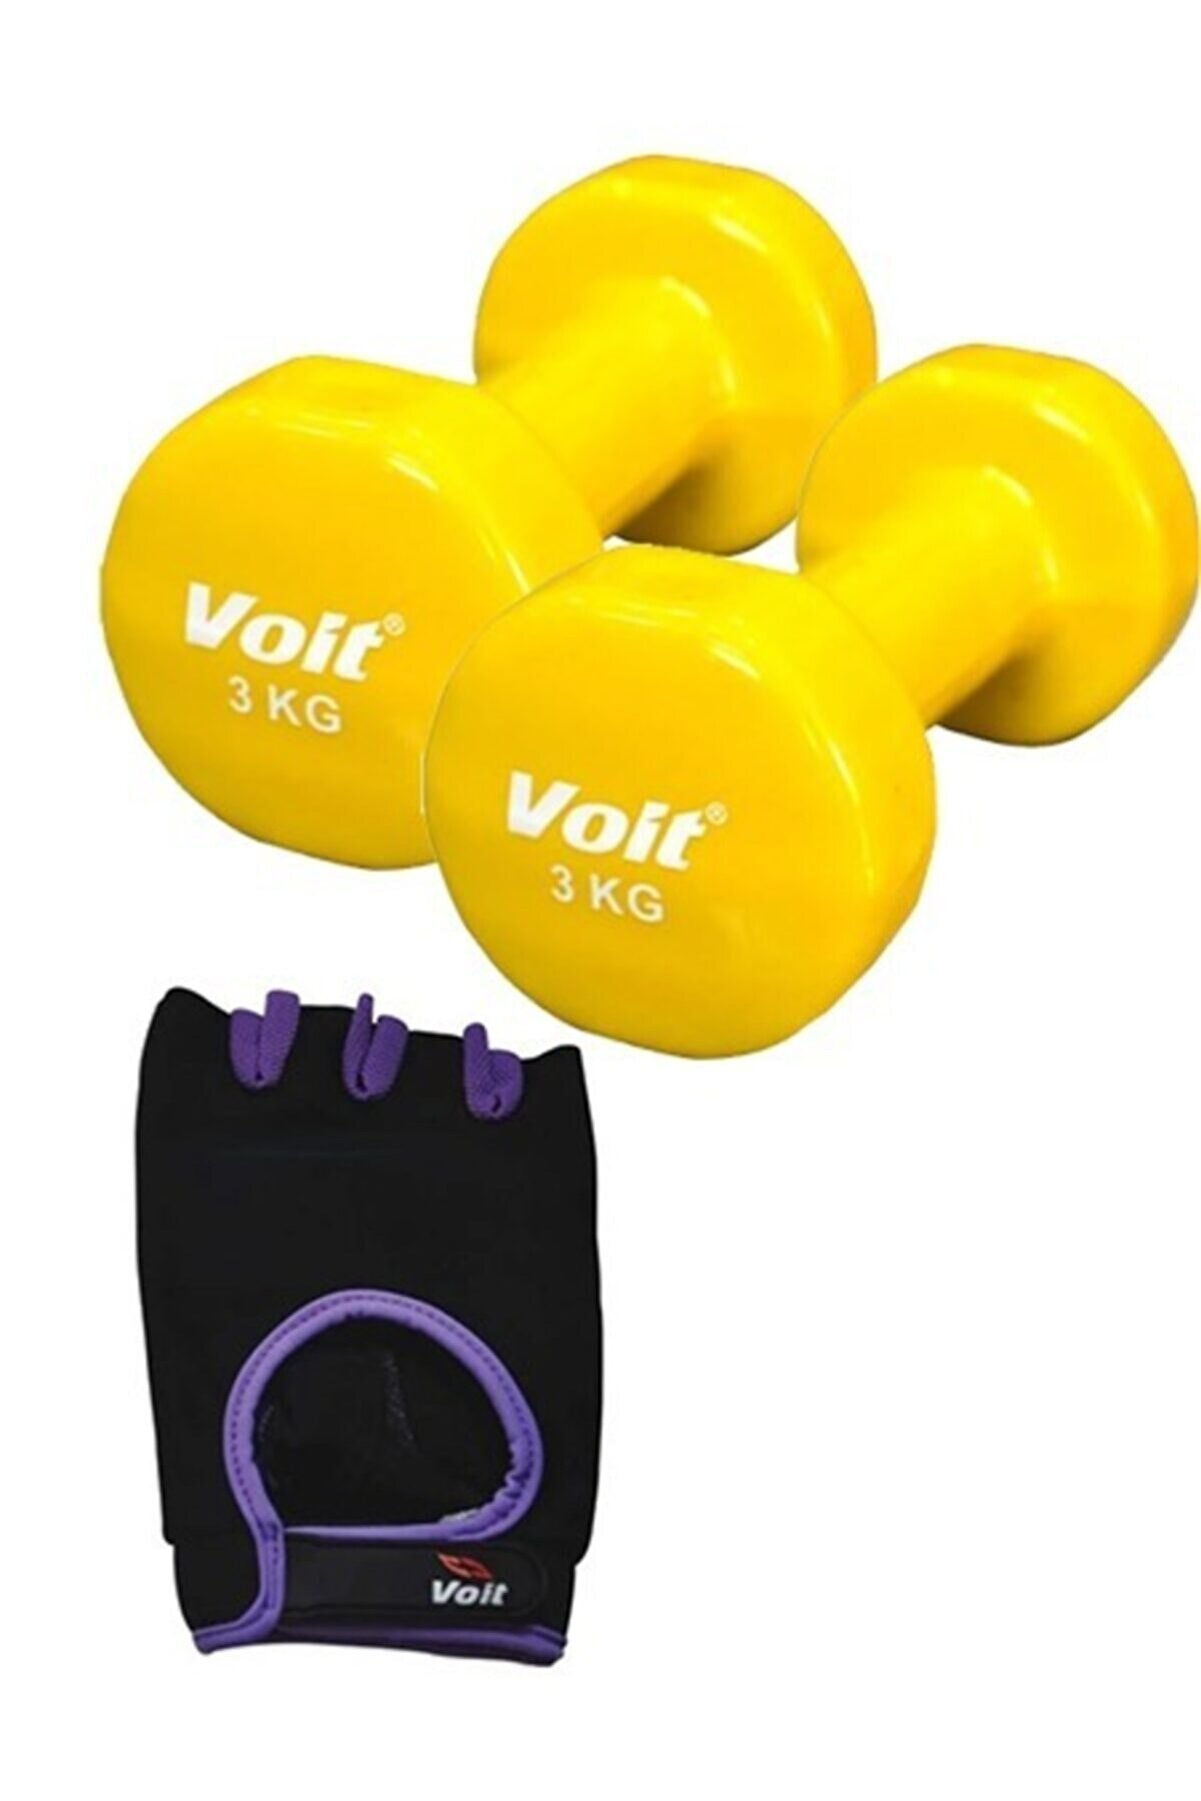 Voit Db107 3kg Sarı Dumbell 2 Adet +1731 Ağırlık Eldiveni Mor